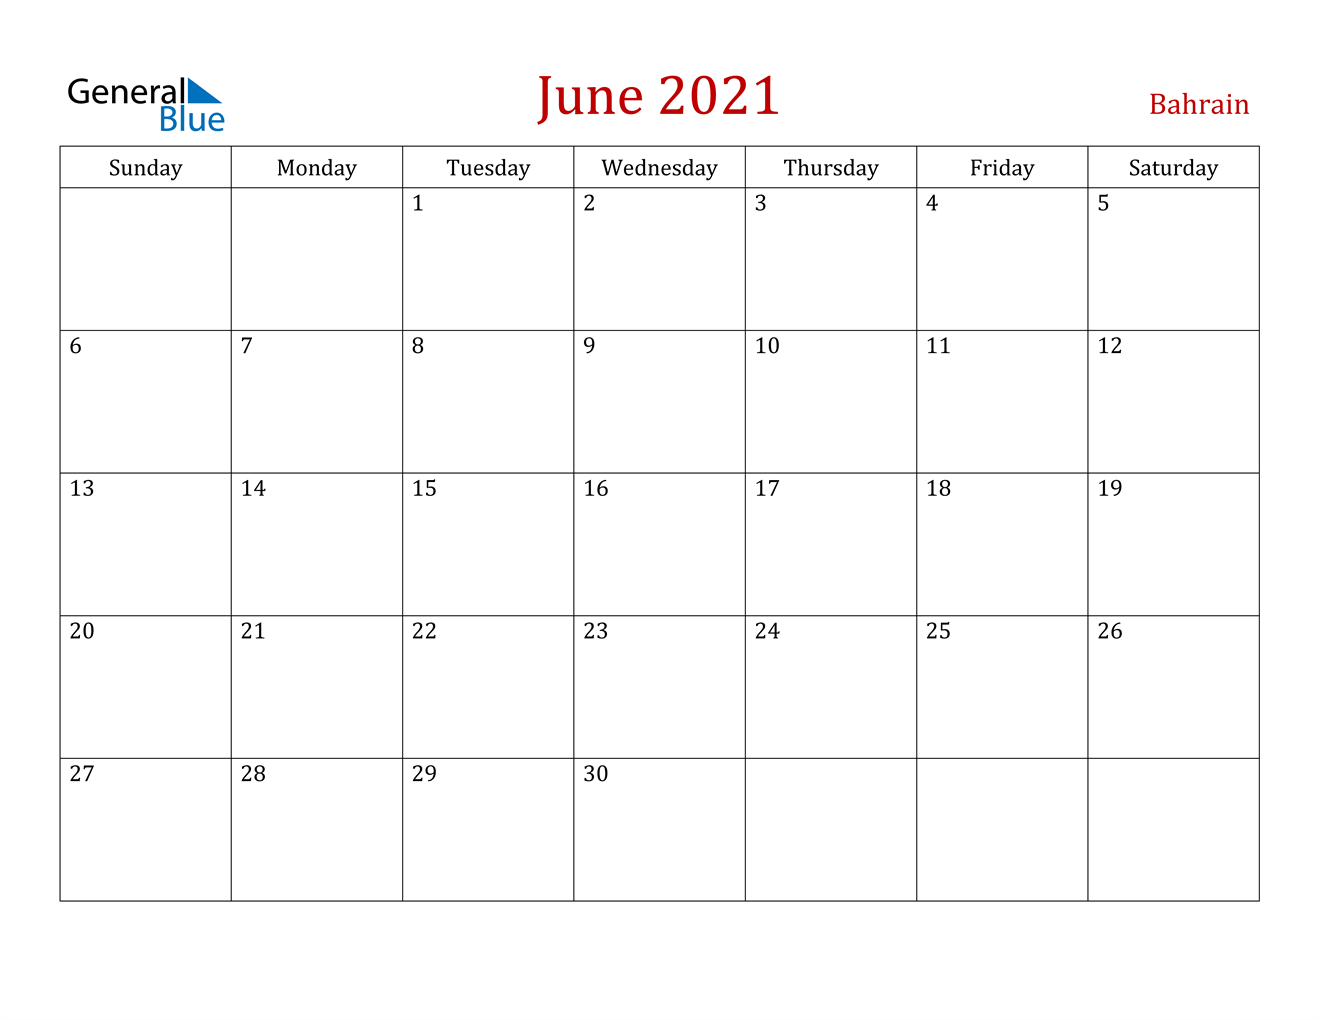 June 2021 Calendar - Bahrain